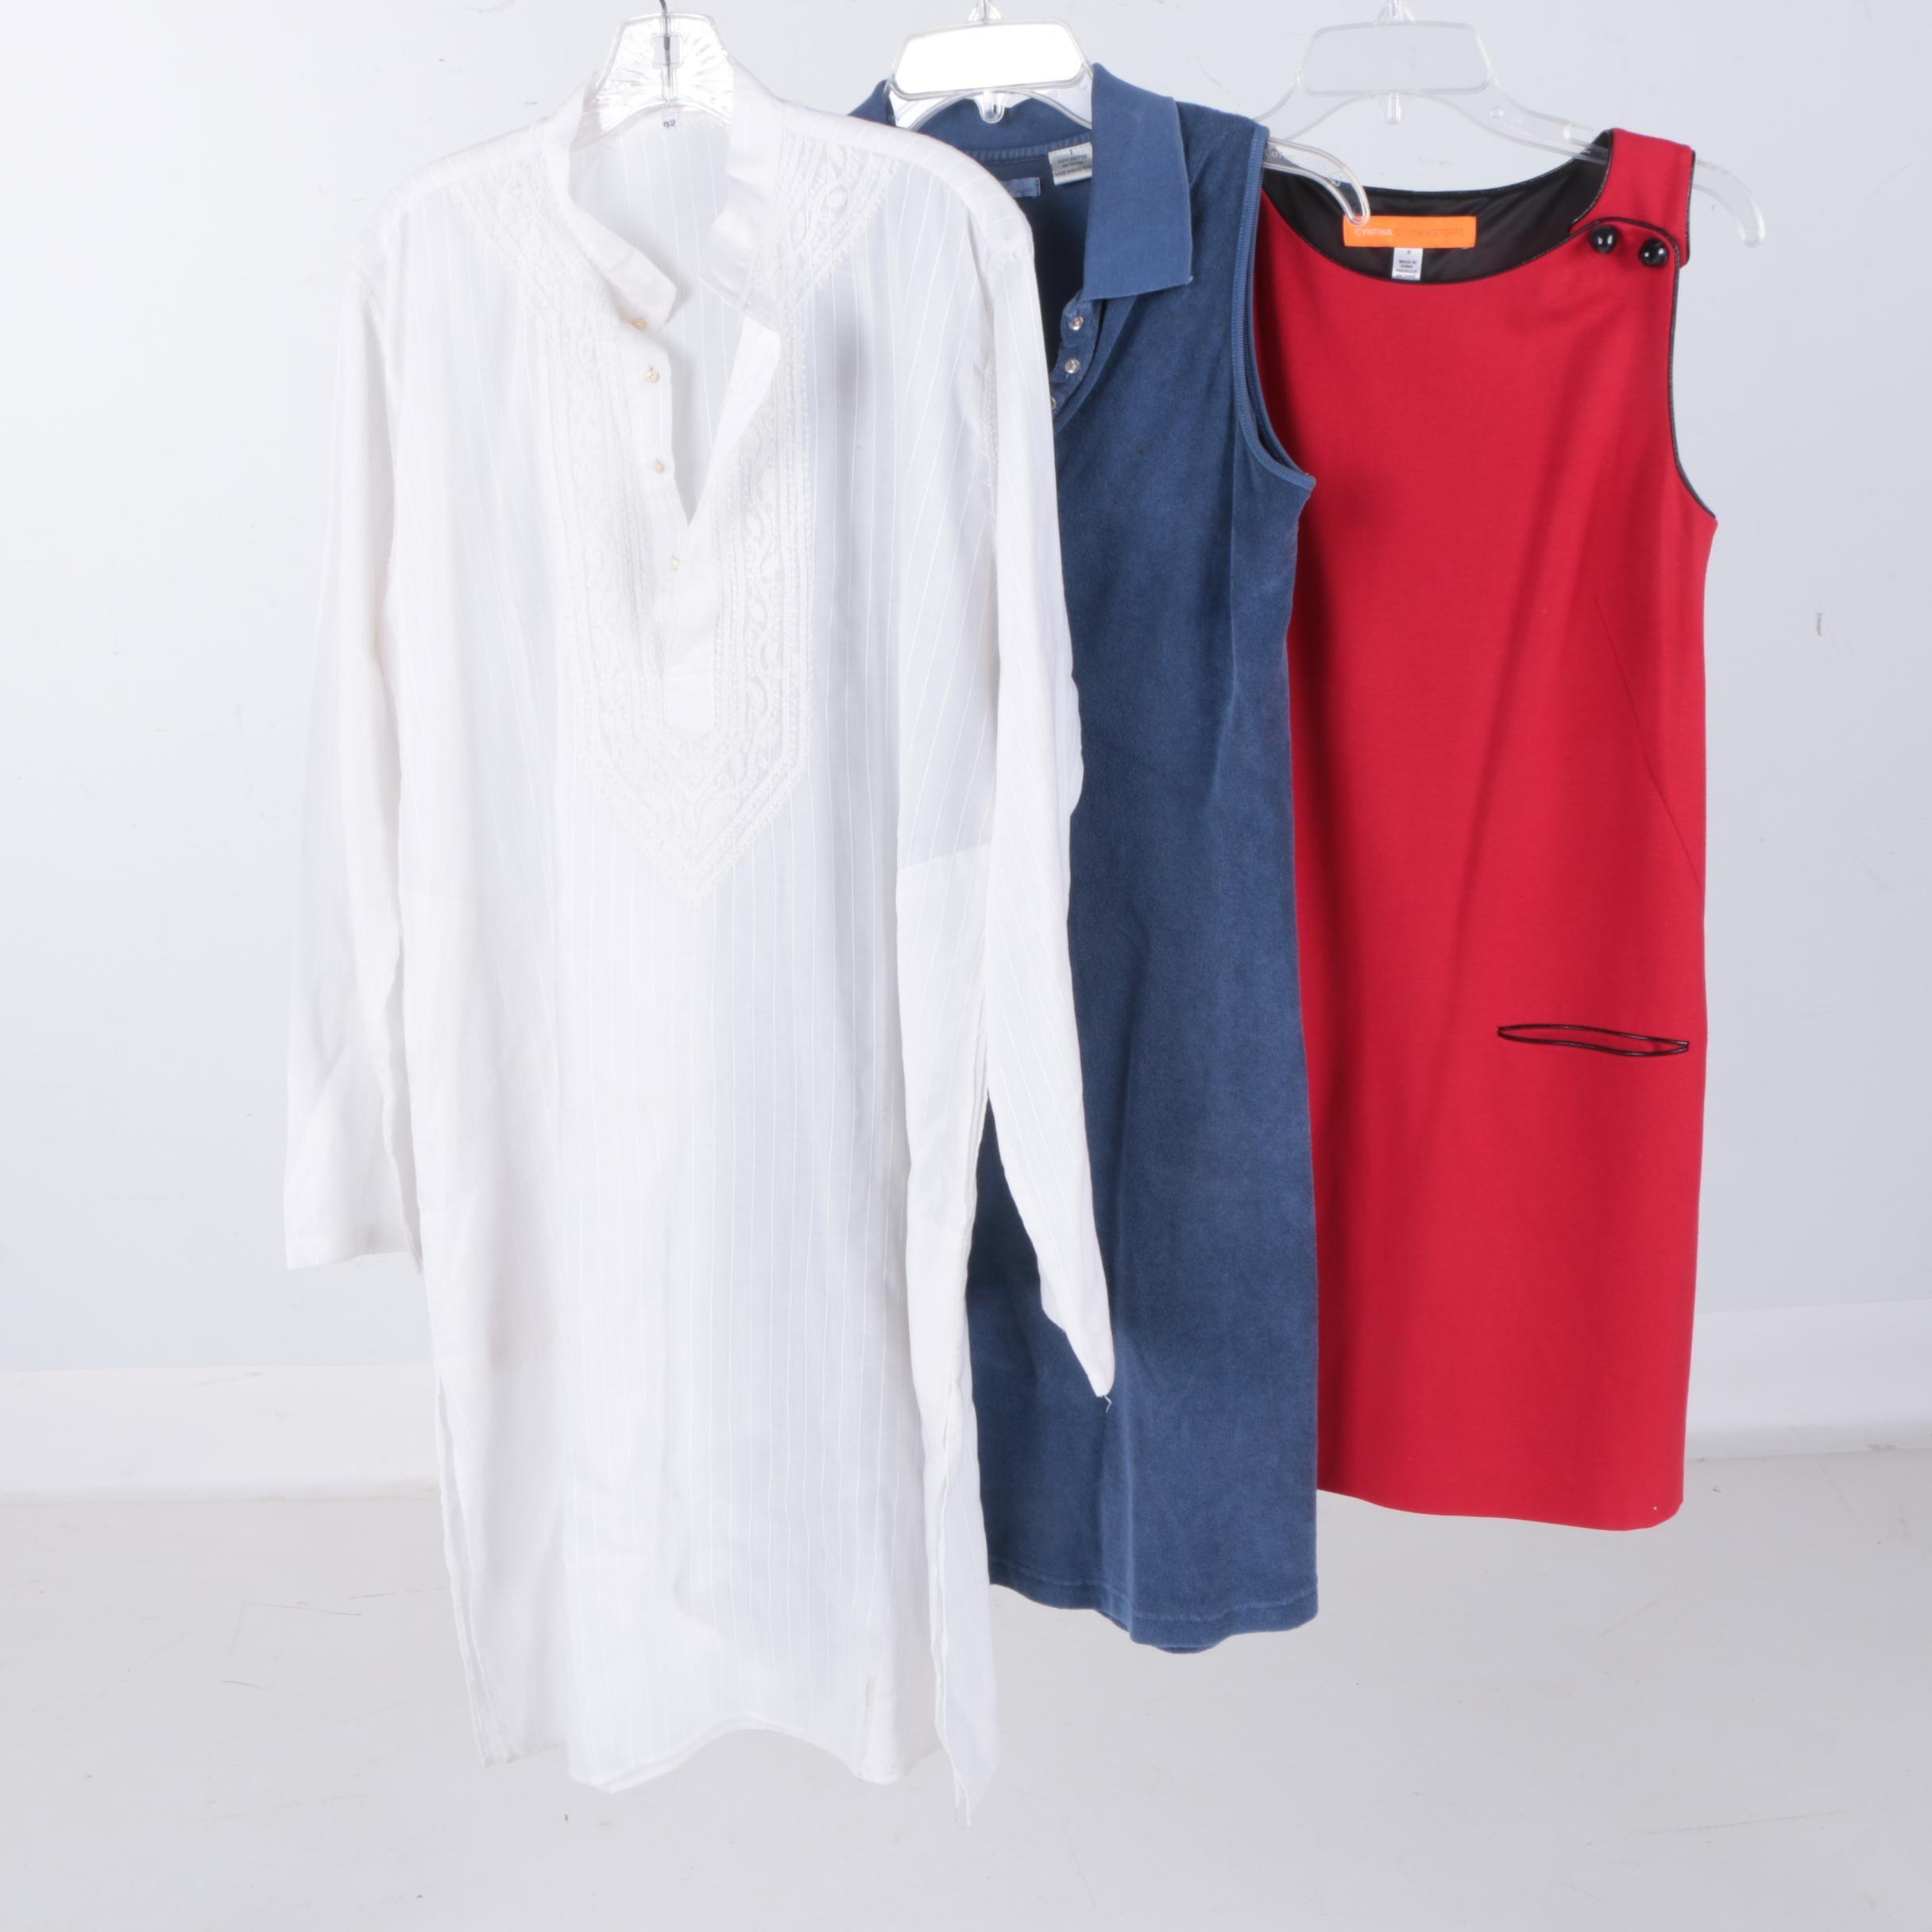 Women's Dresses Including Cynthia Steffe